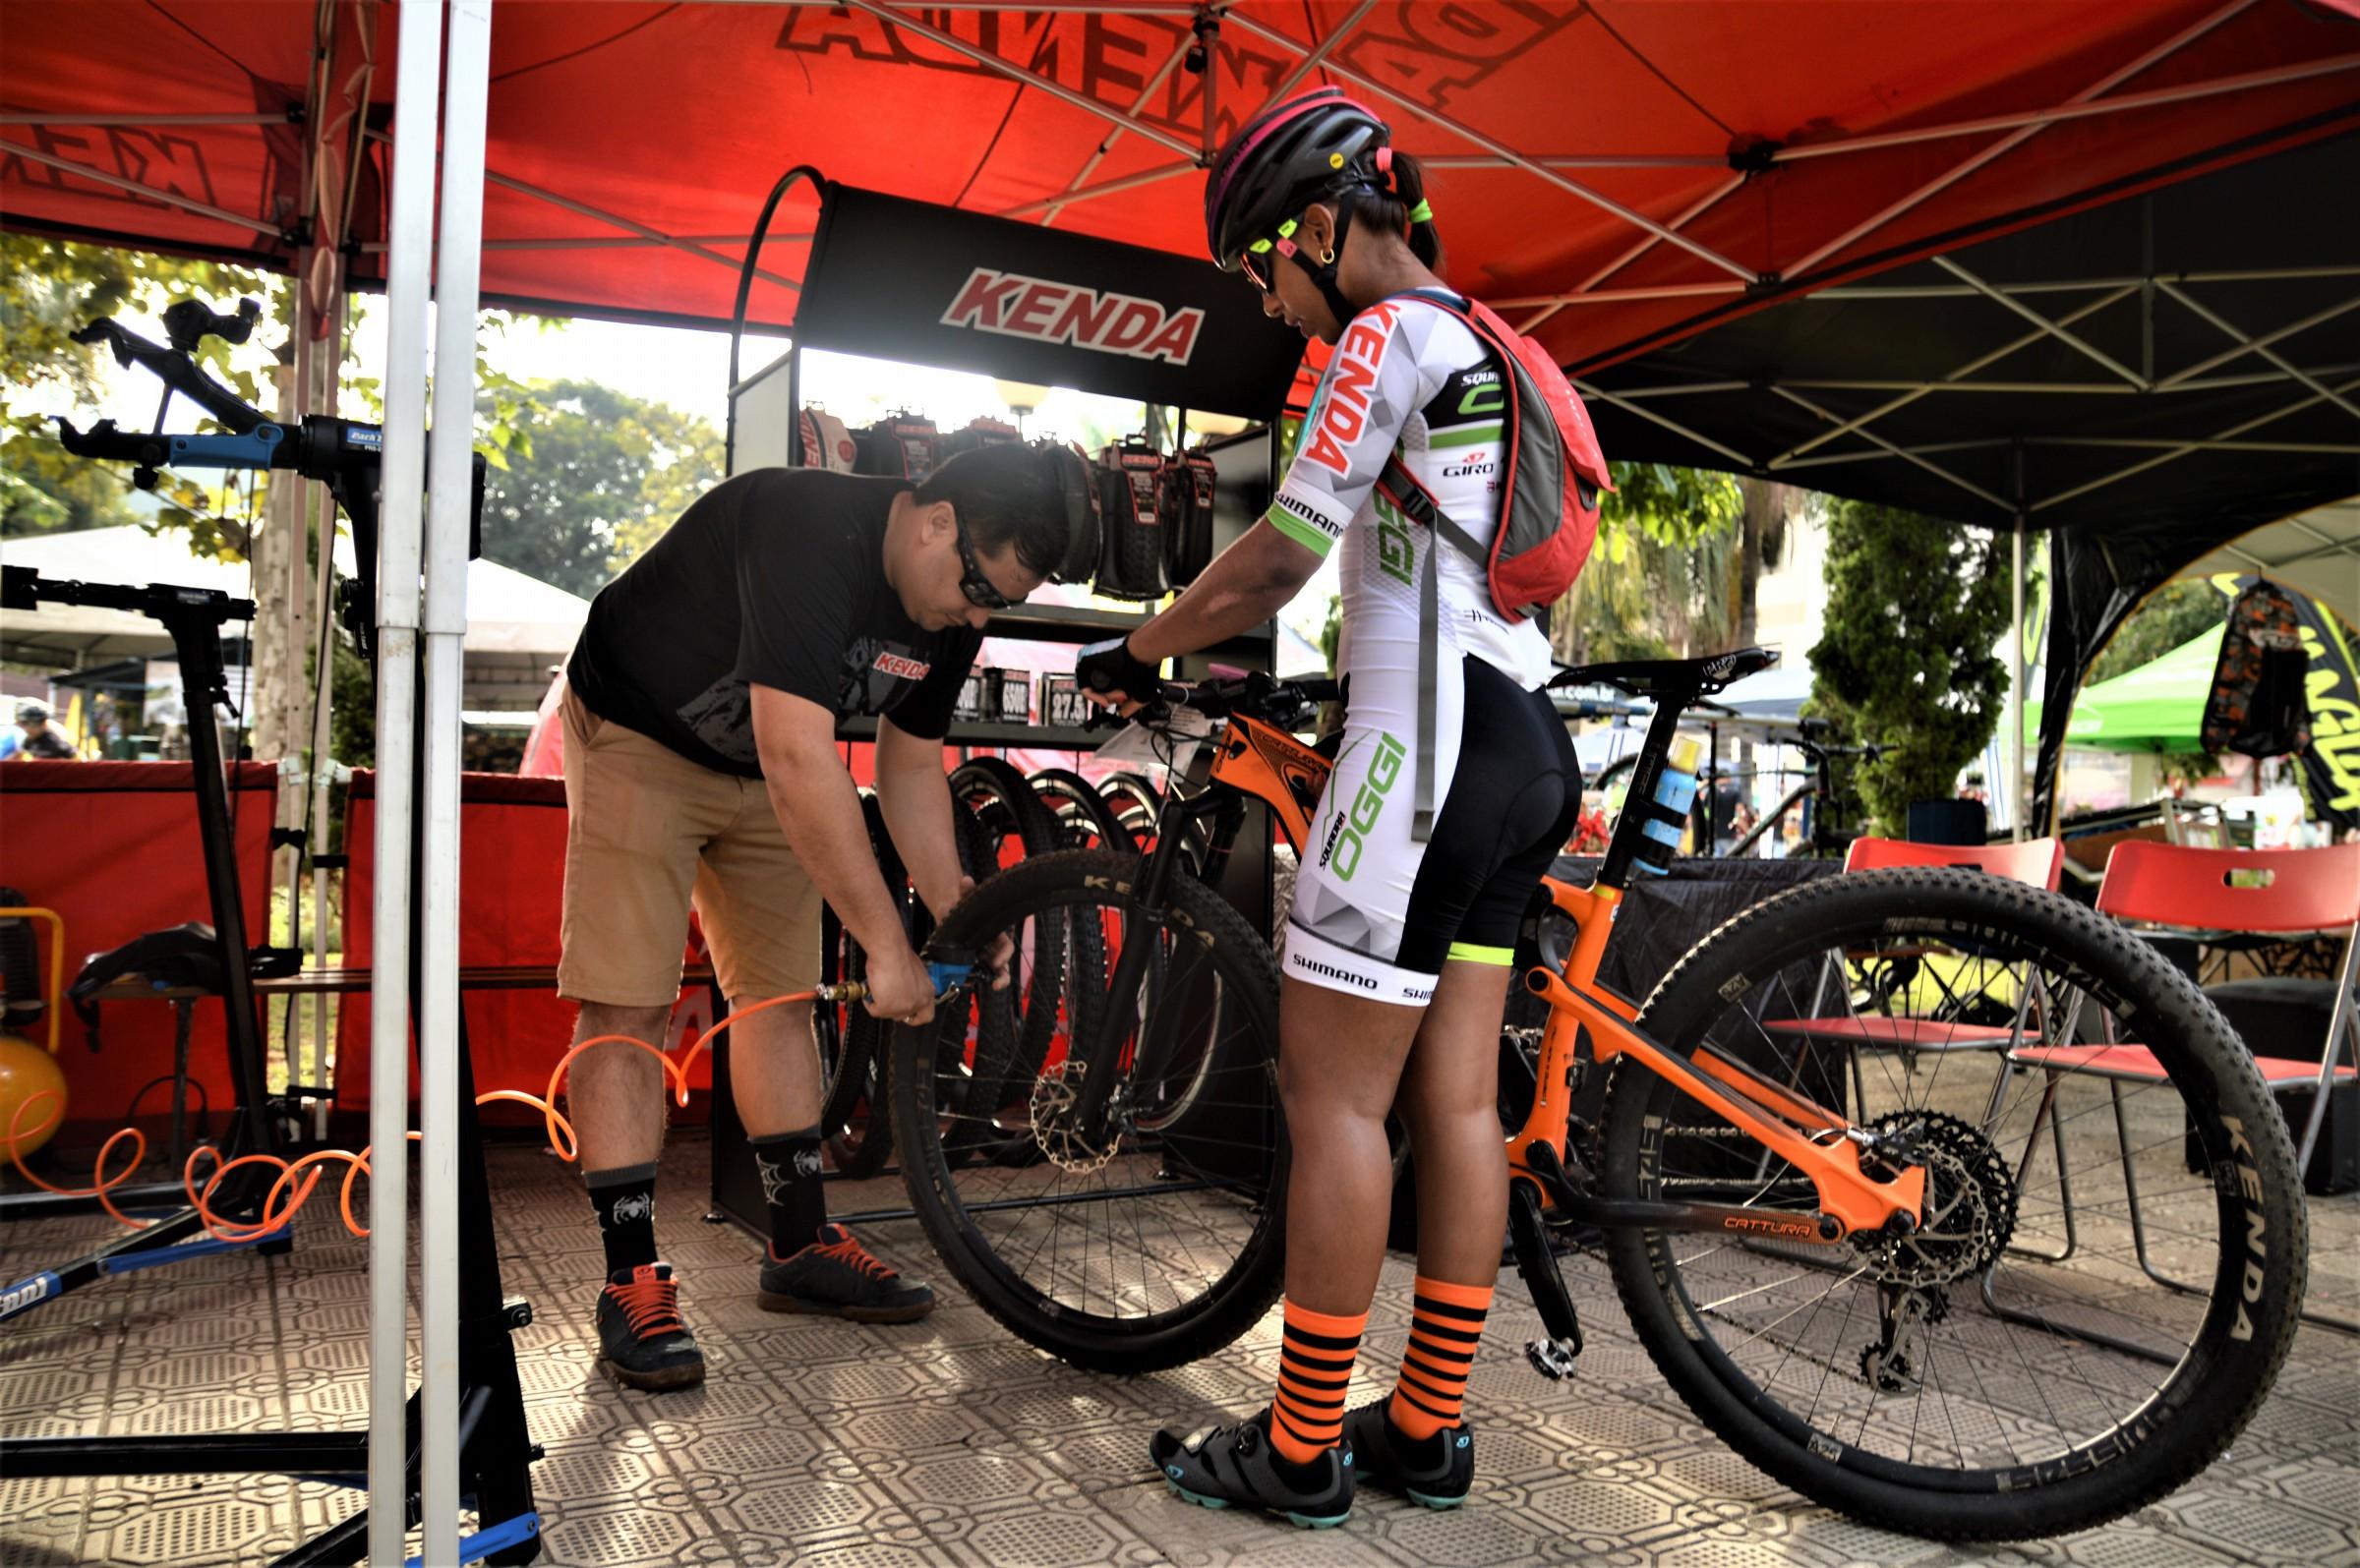 https://seppia.com.br/wp-content/uploads/2019/06/Oggi-Big-Biker-Cup-Itanhandu-Pit-Stop-Kenda-Largura-M%C3%A1x-2400-Altura-M%C3%A1x-1800.jpg